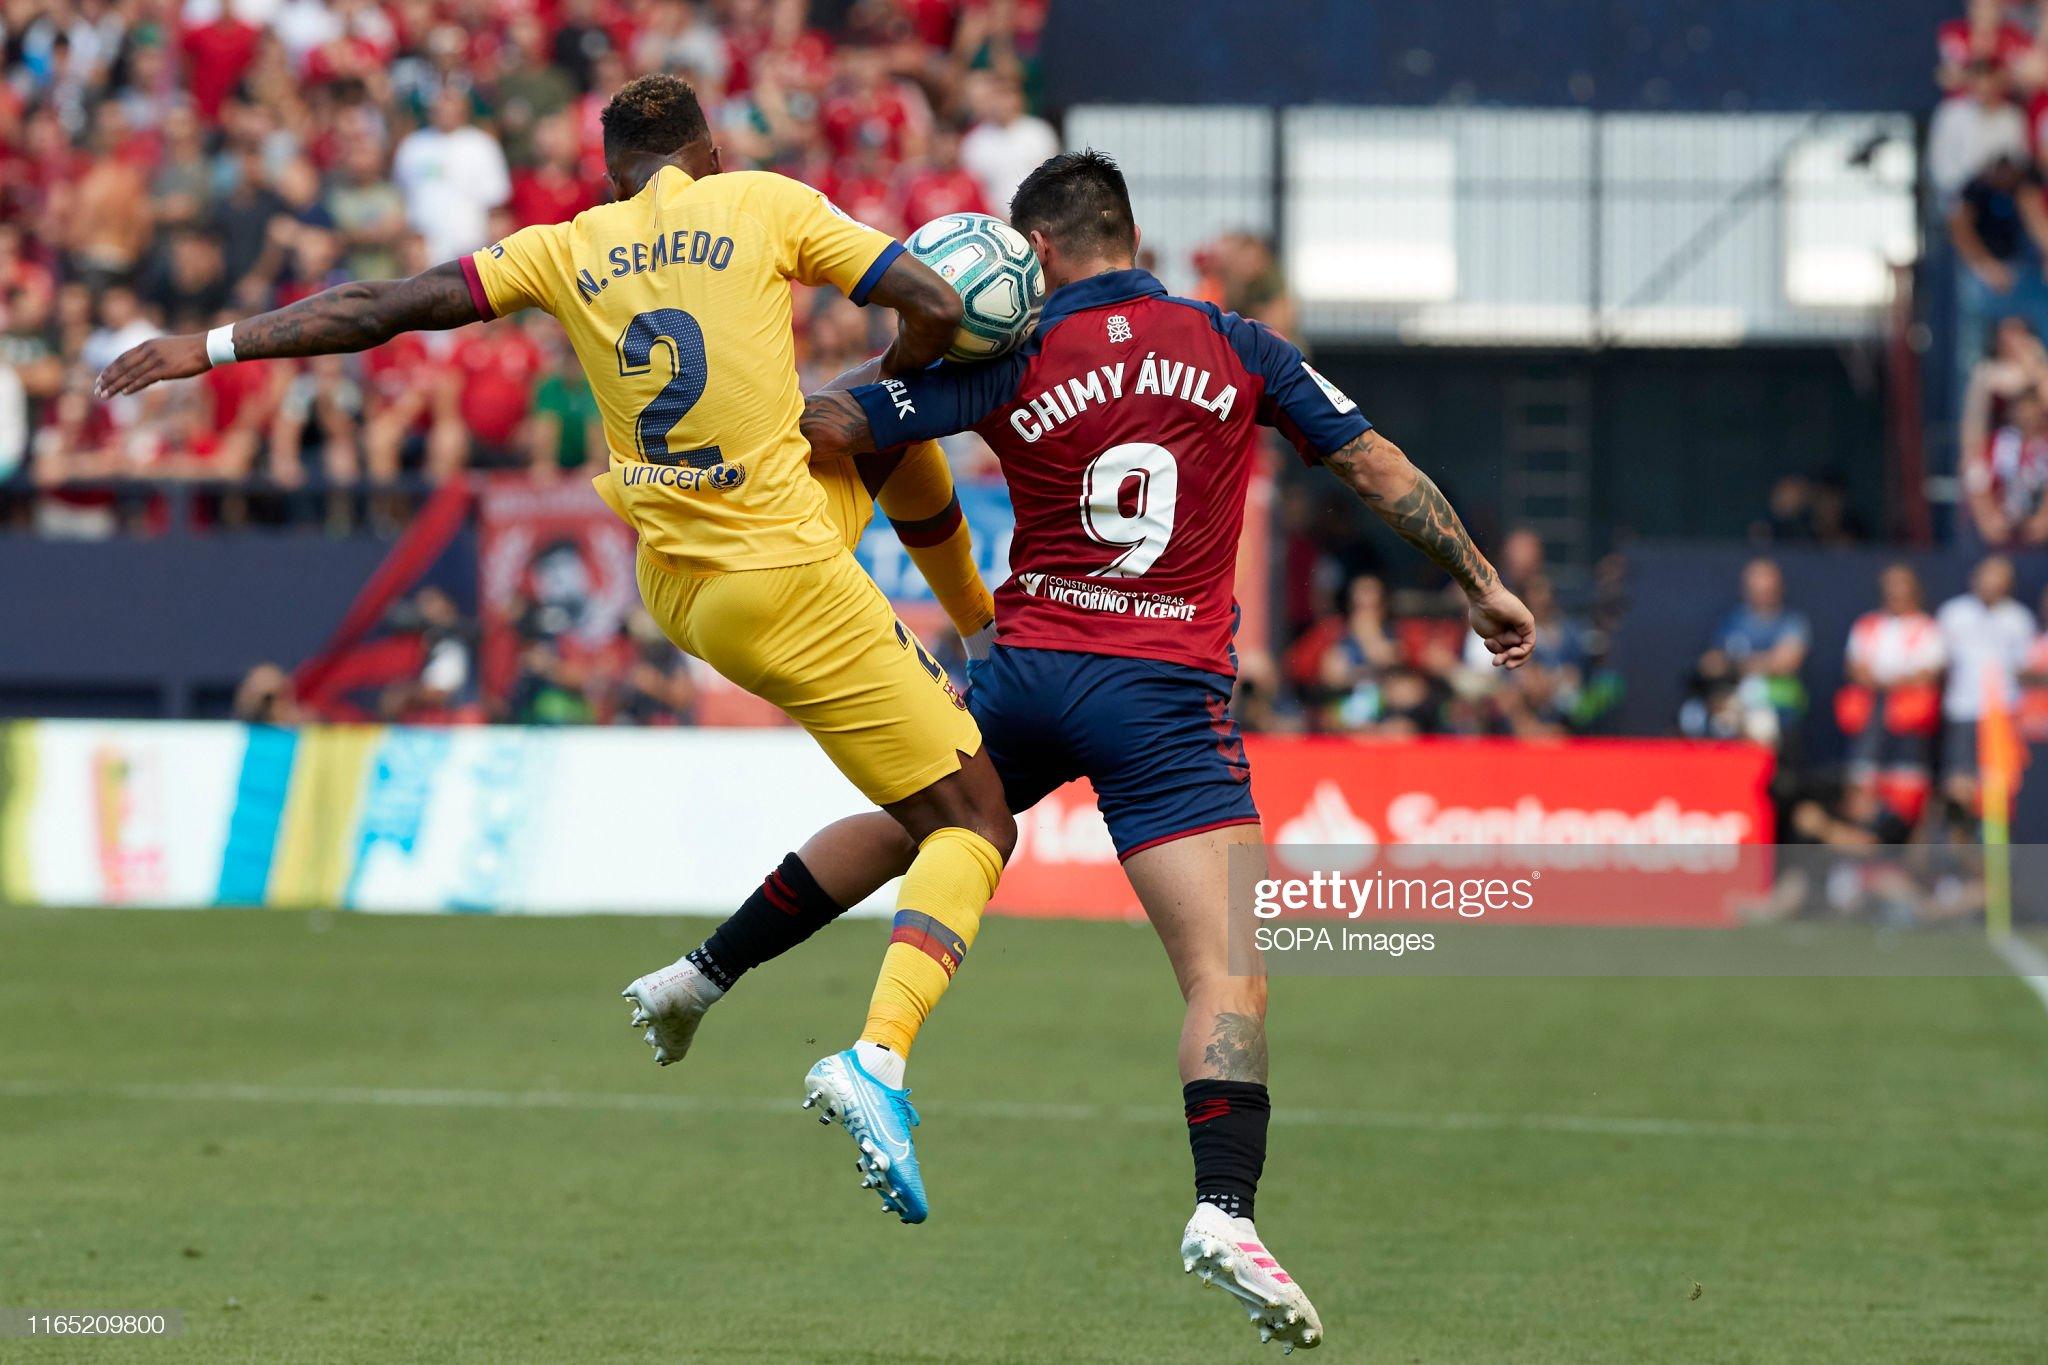 صور مباراة : أوساسونا - برشلونة 2-2 ( 31-08-2019 )  Chimy-avila-and-nelson-semedo-in-action-during-the-spanish-la-liga-picture-id1165209800?s=2048x2048